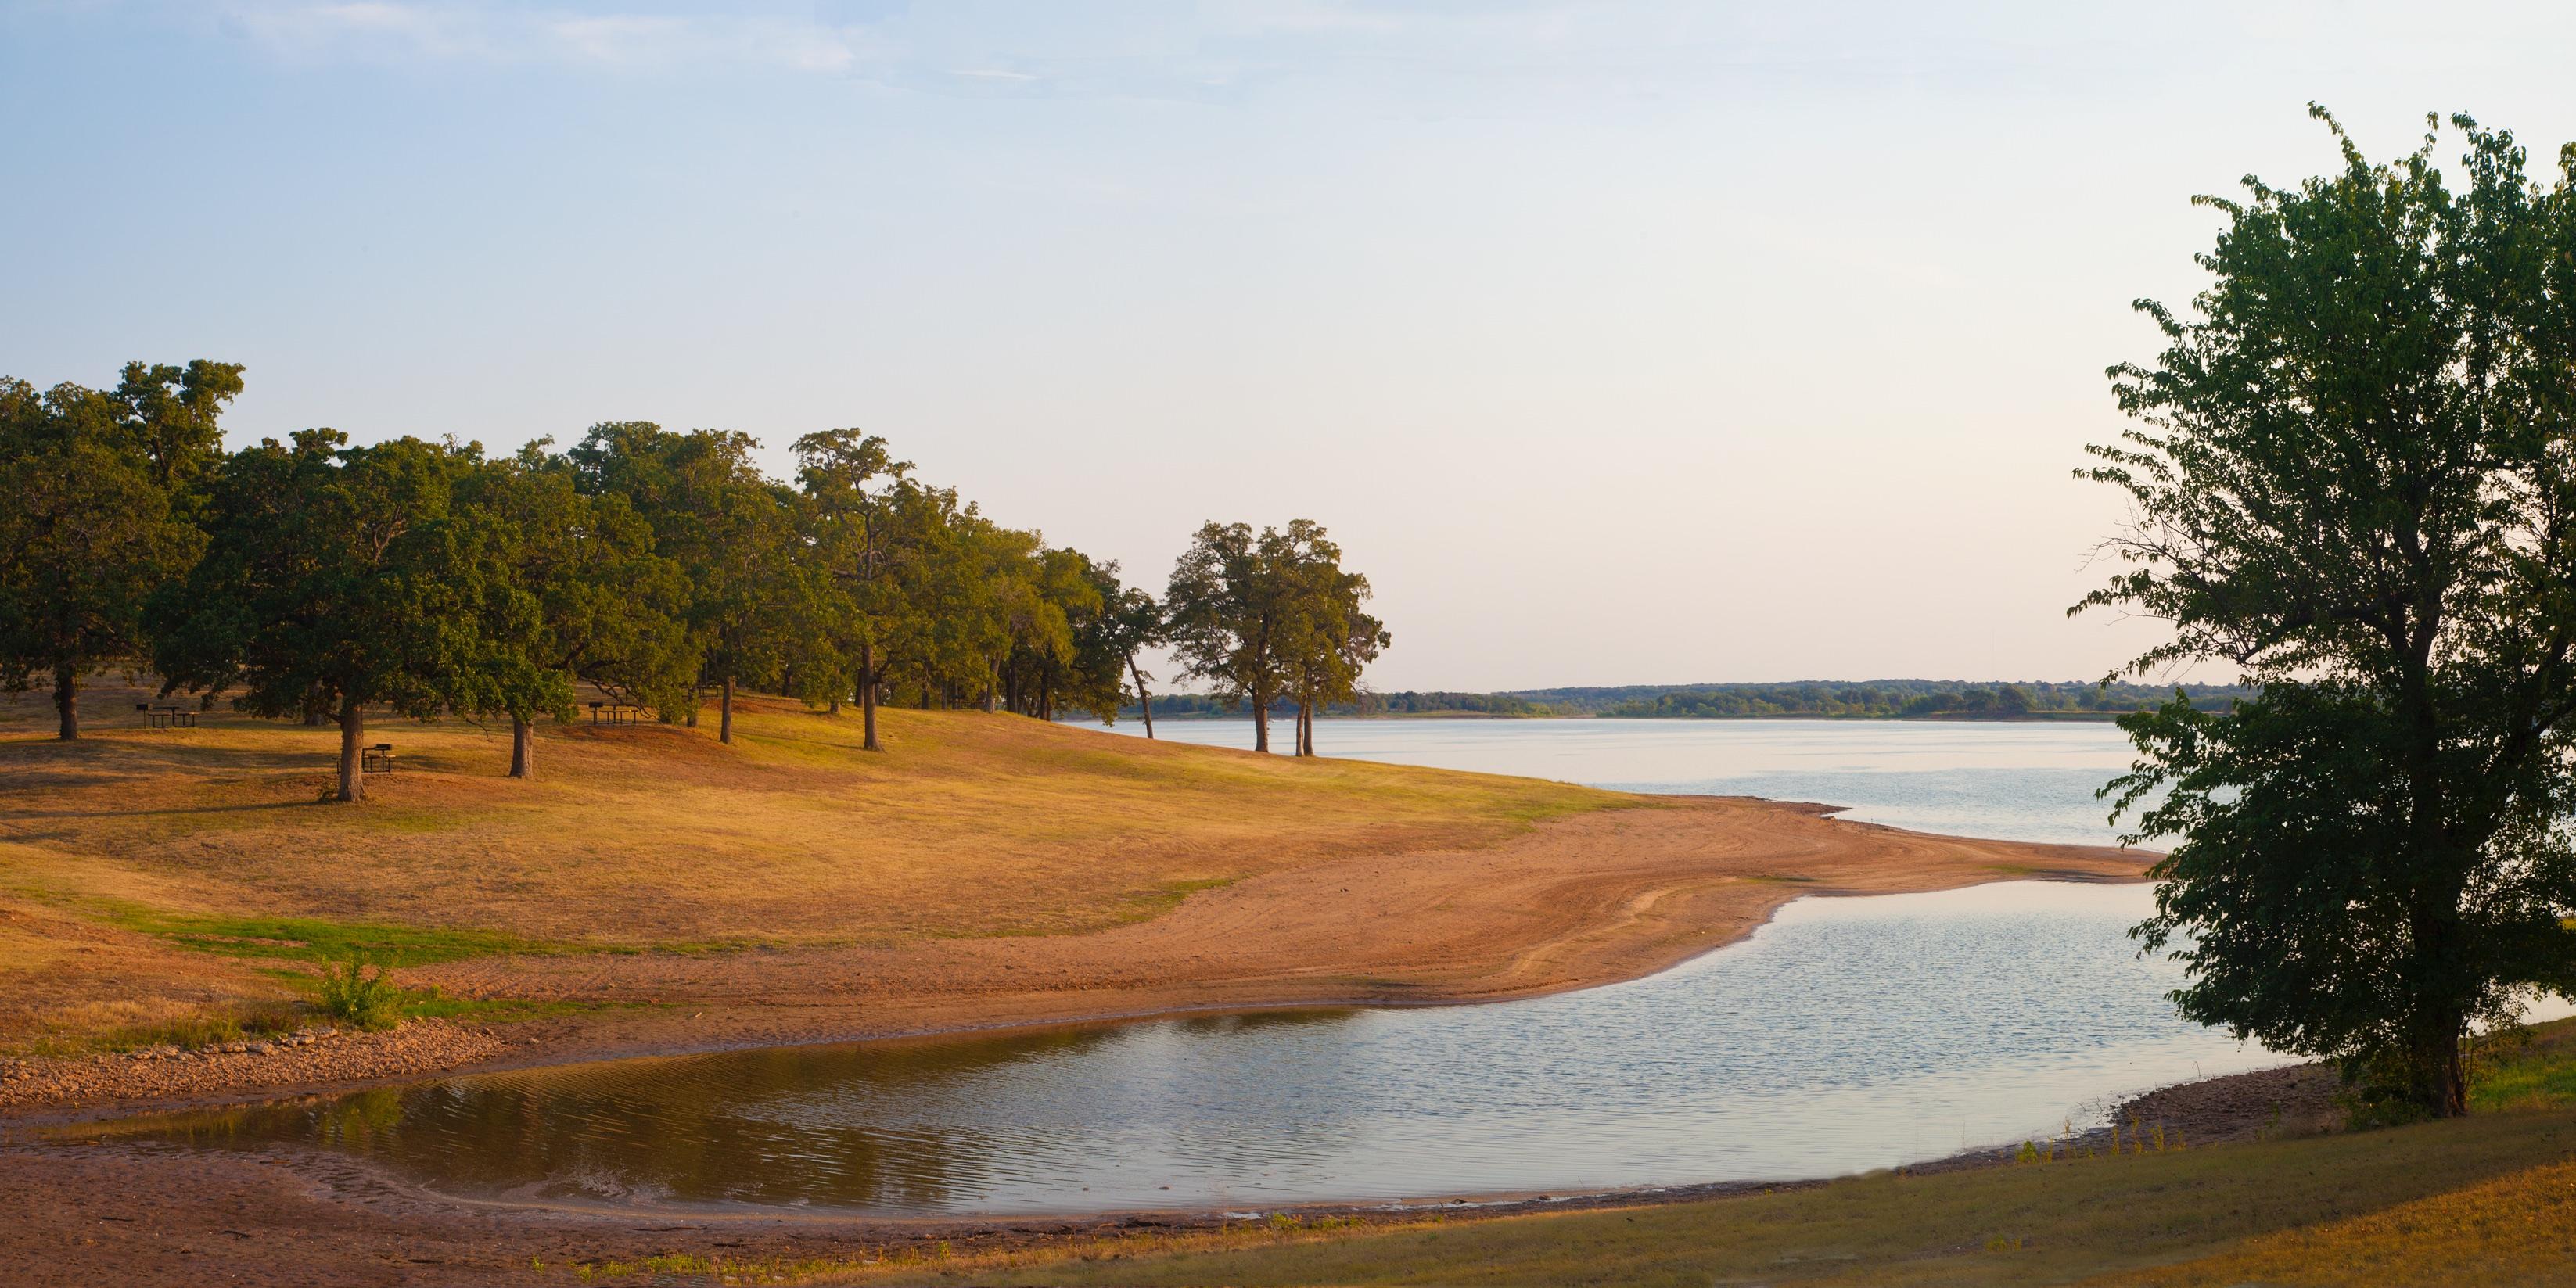 Photo of the shore of Lake Texoma